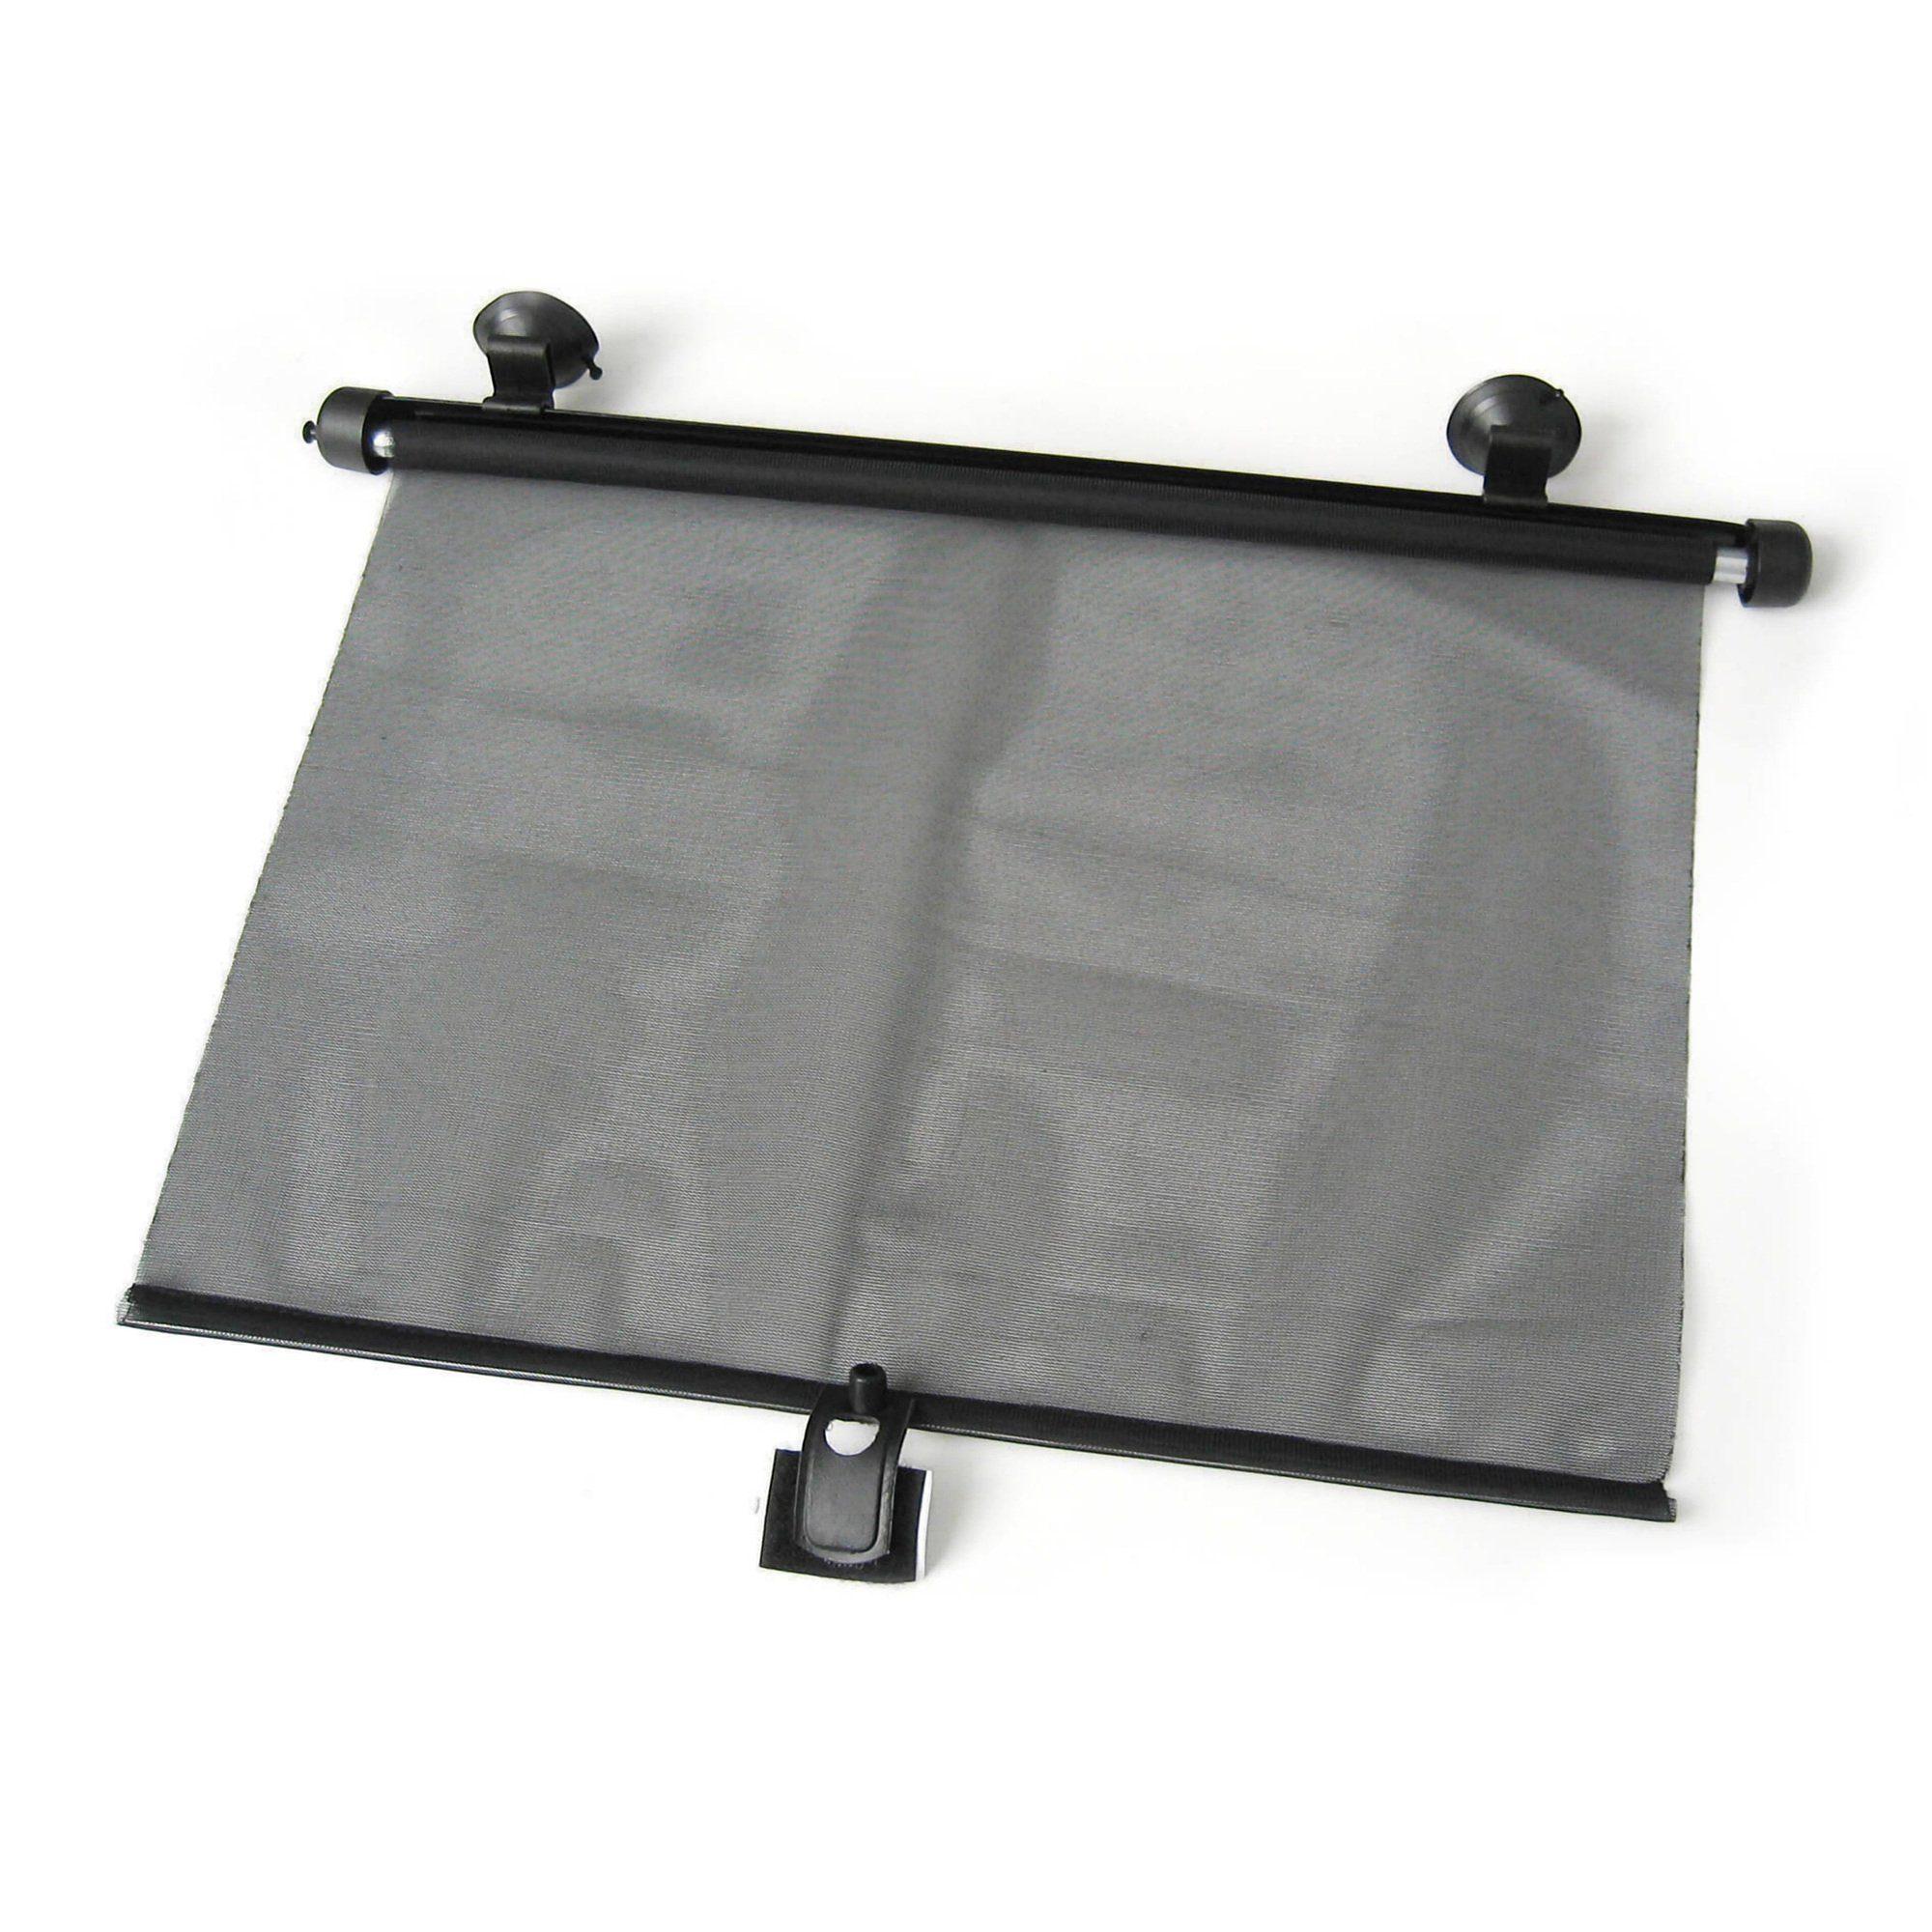 REER Auto-Sonnenschutzrollo